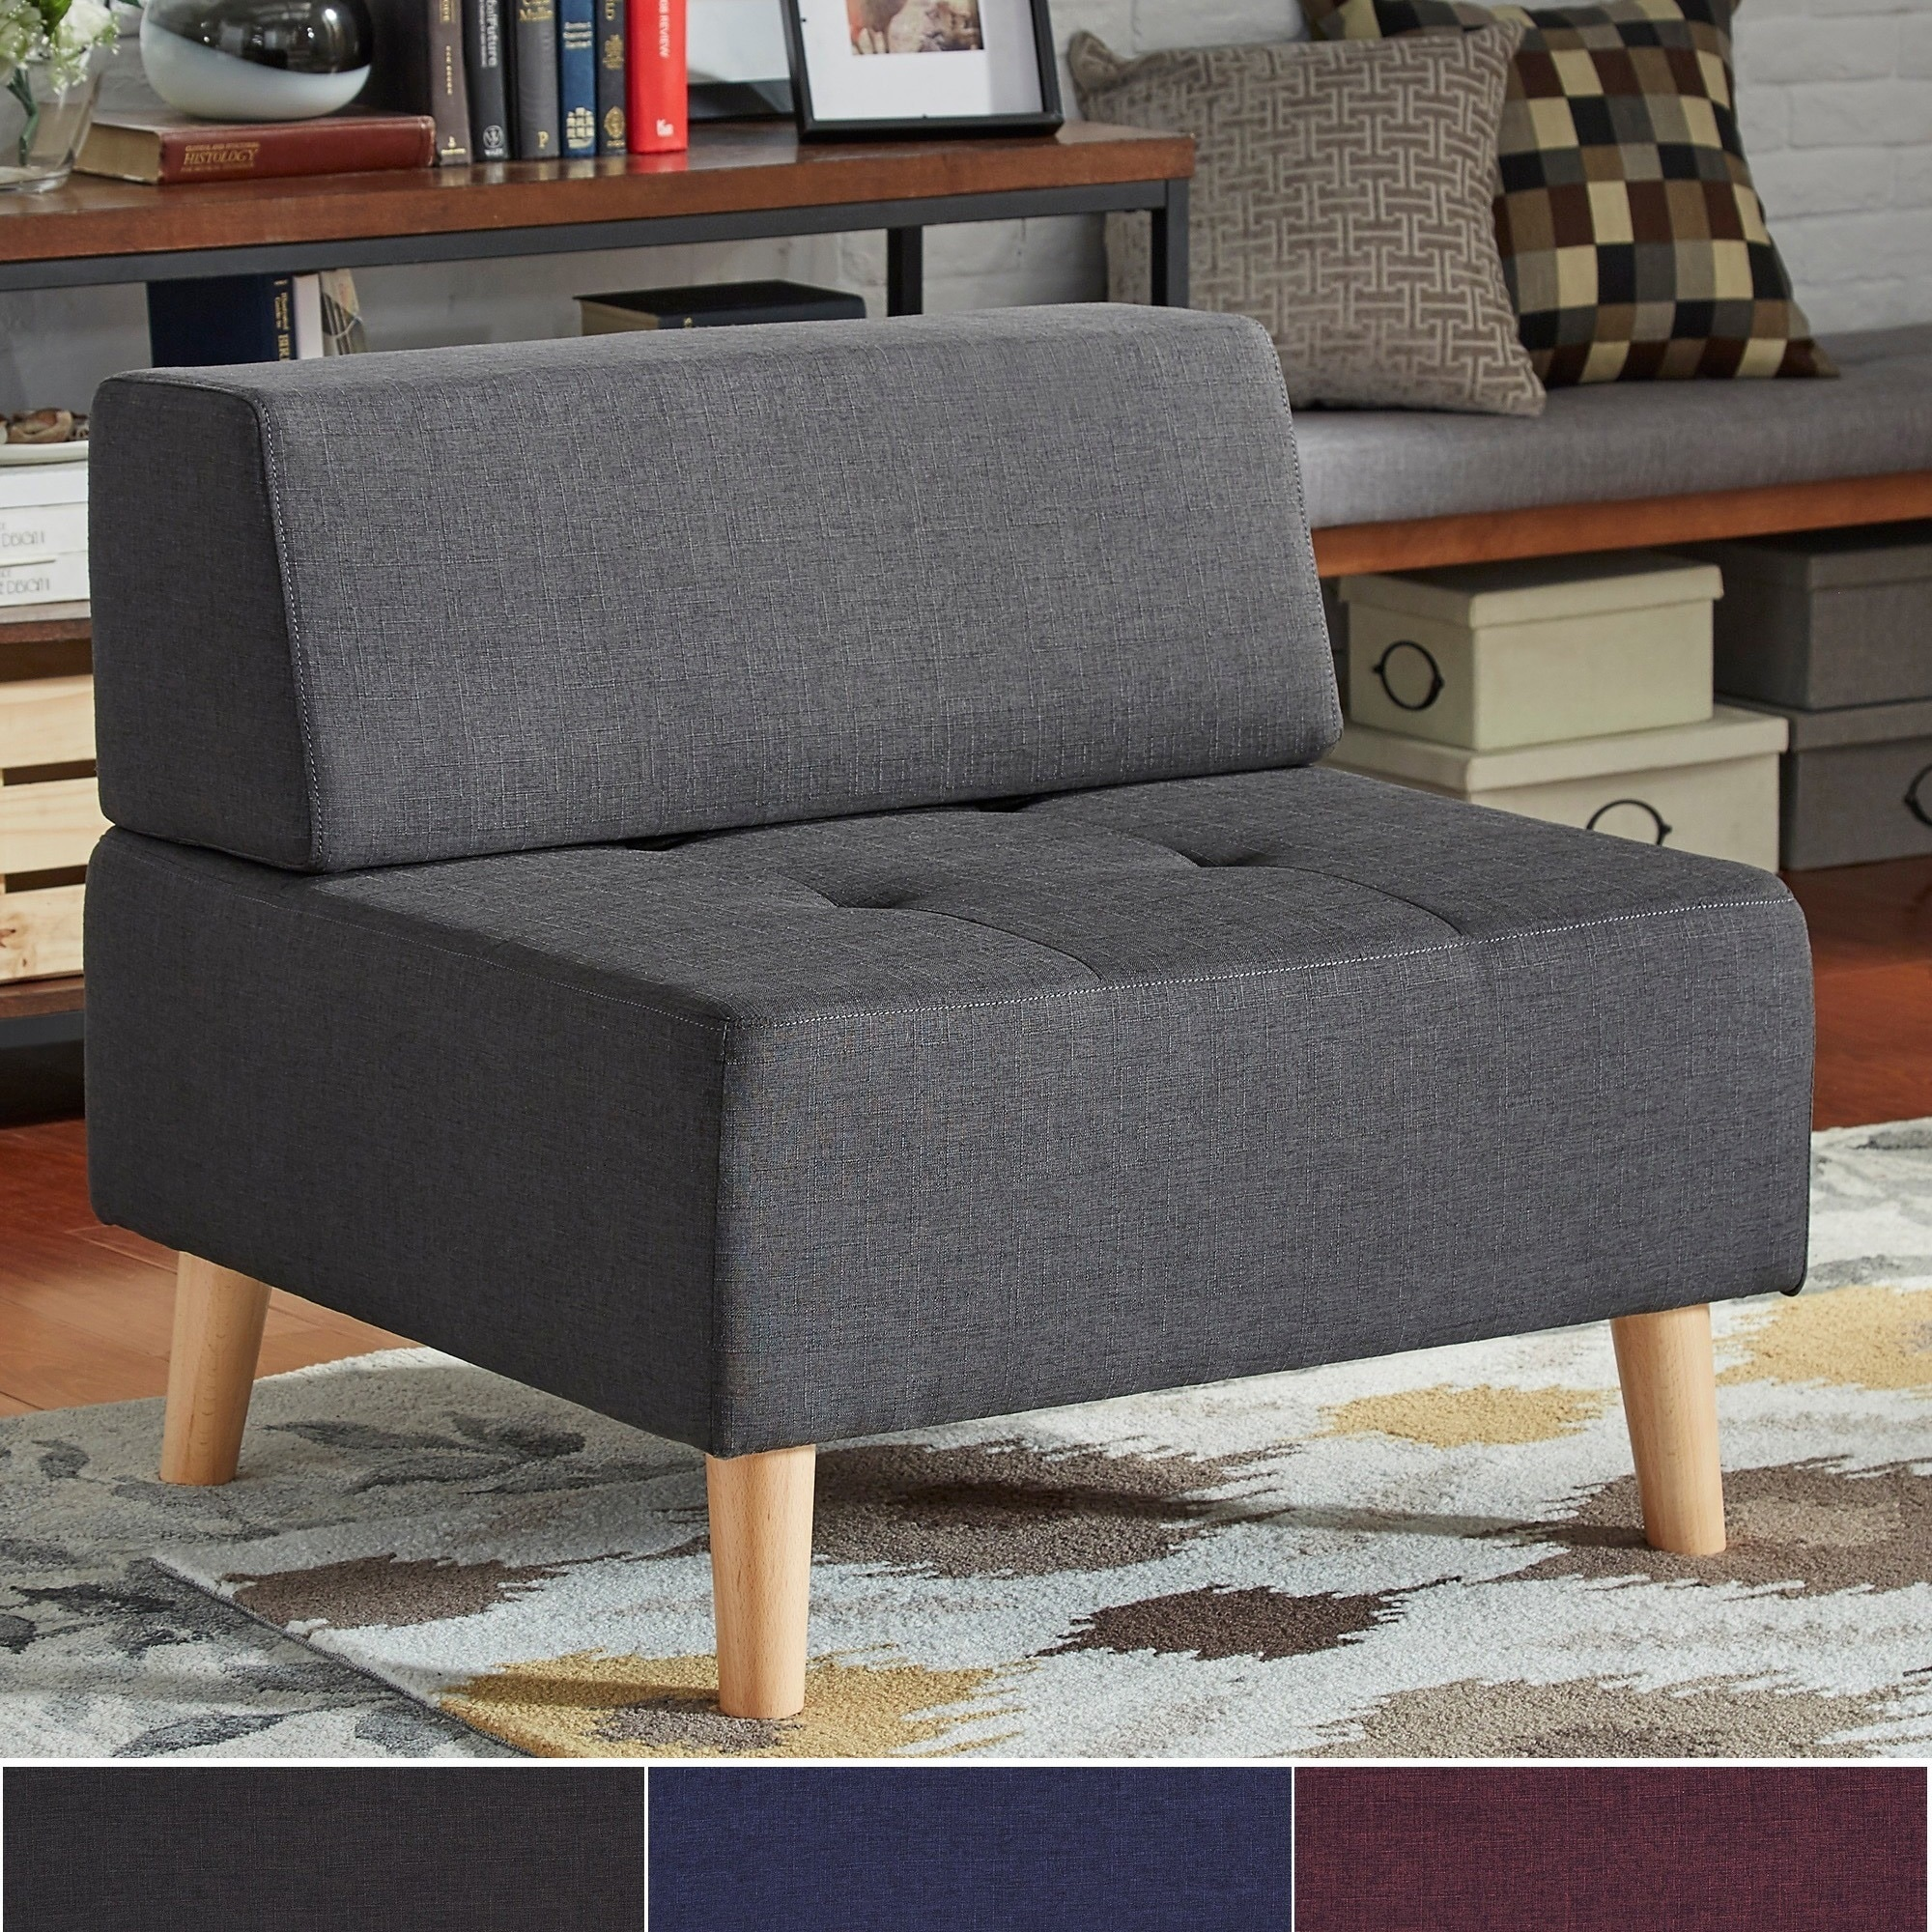 Soto Modern Upholstered Modular Ottoman Chair iNSPIRE Q M...